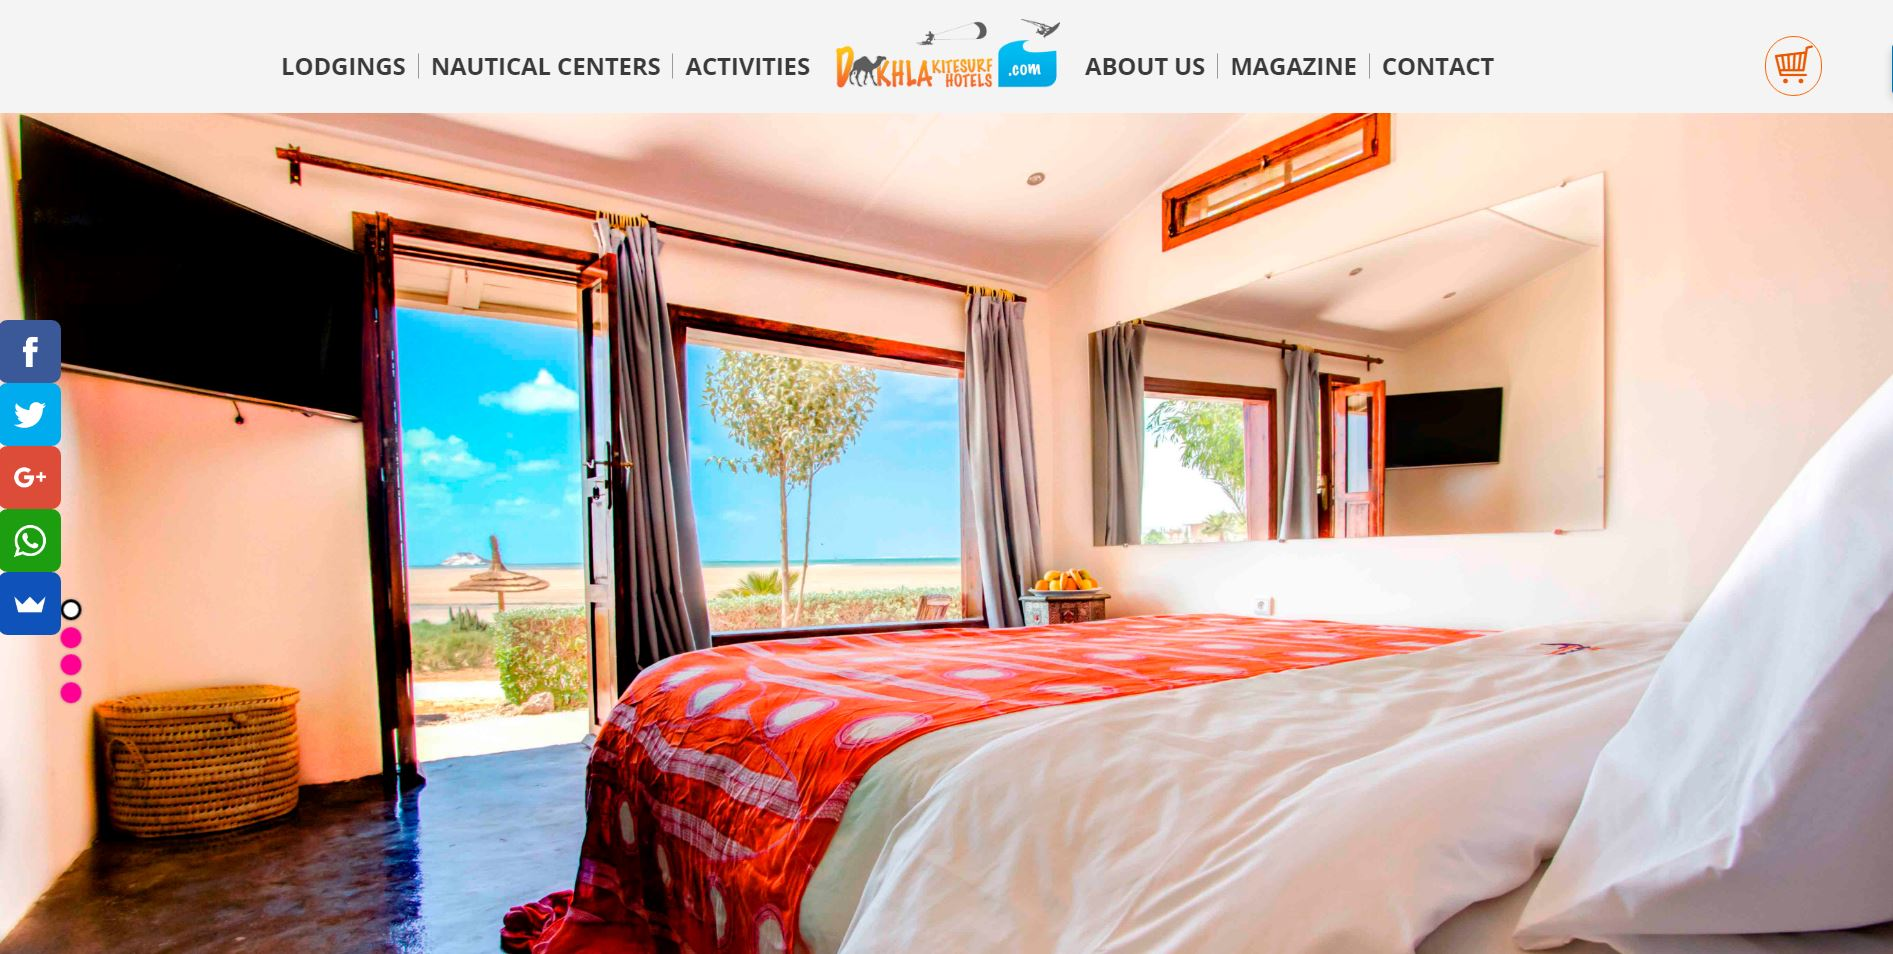 Dakhla kitesurf hotels marketing online malaga dise o for Hotel diseno malaga